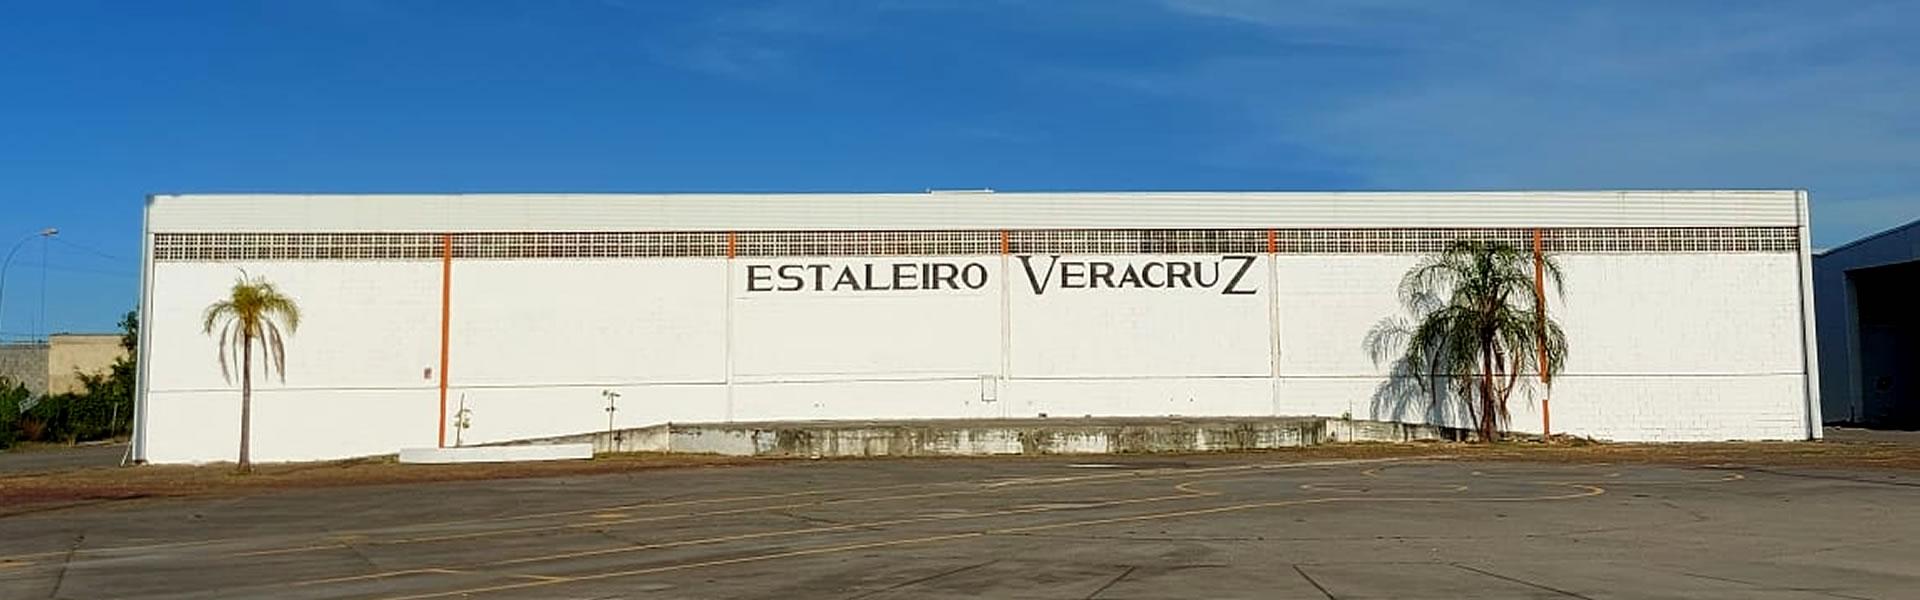 Estaleiro Vera Cruz Yachts